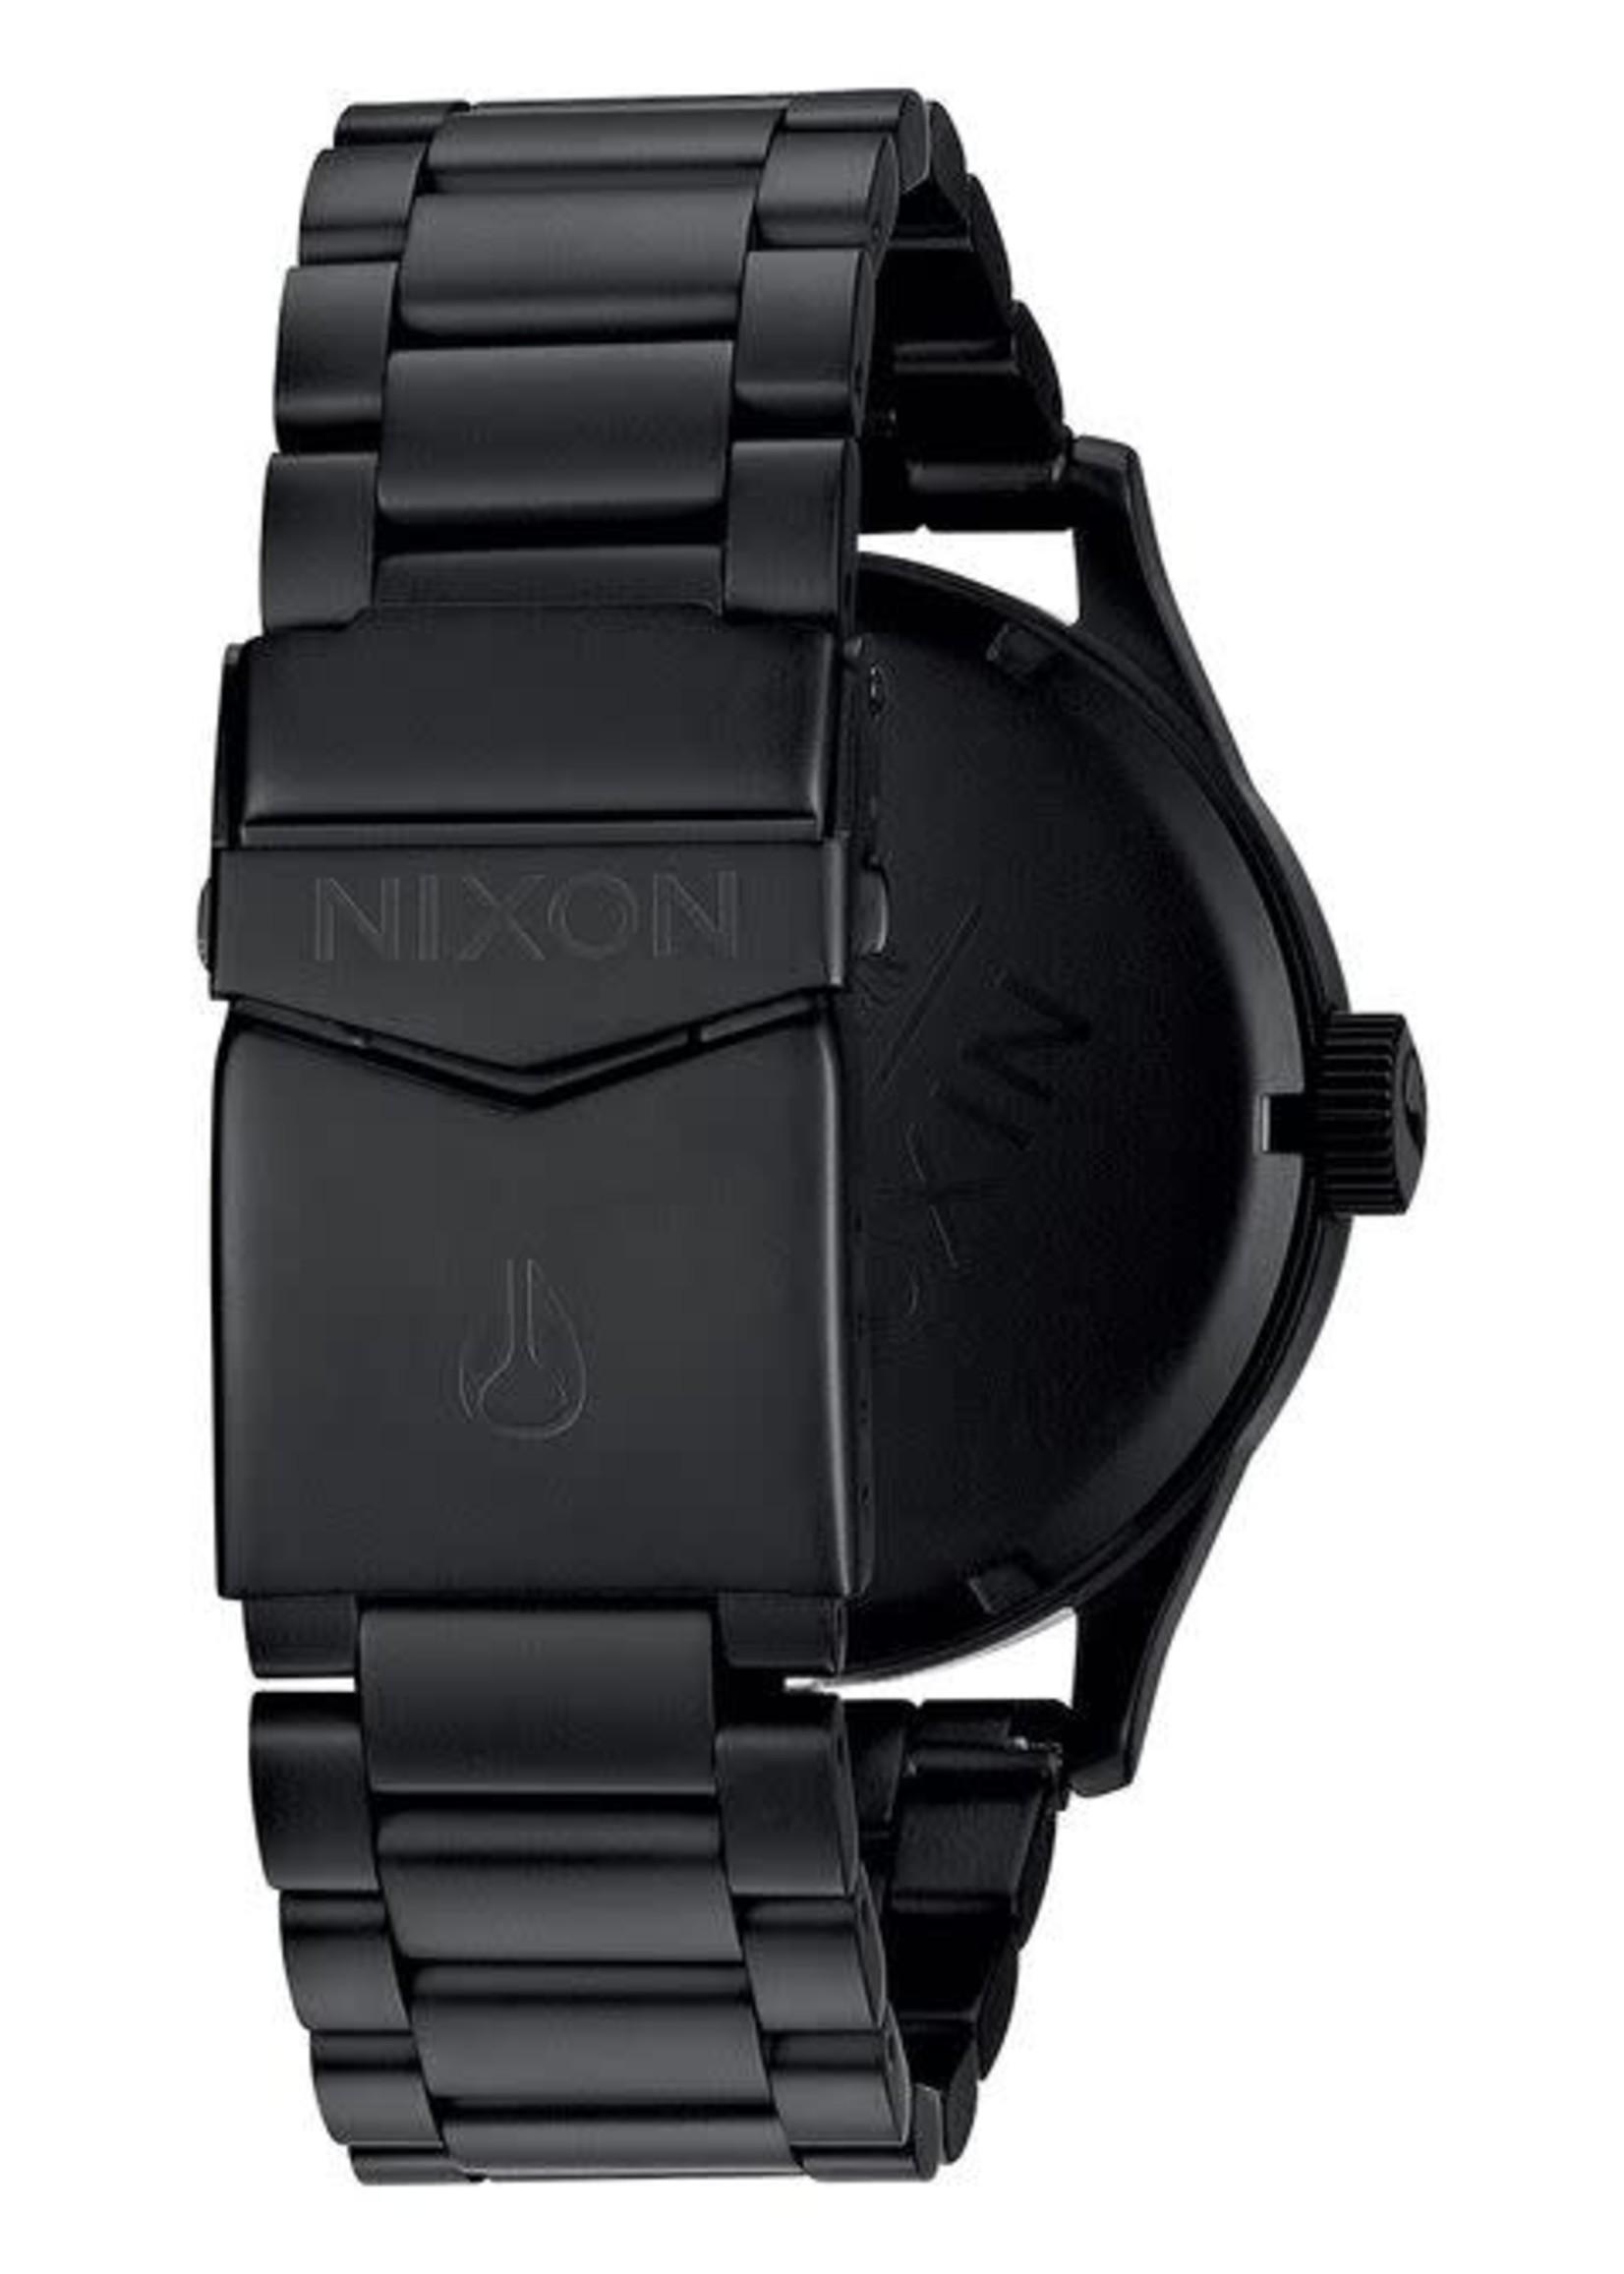 NIXON Sentry Watch, All Black